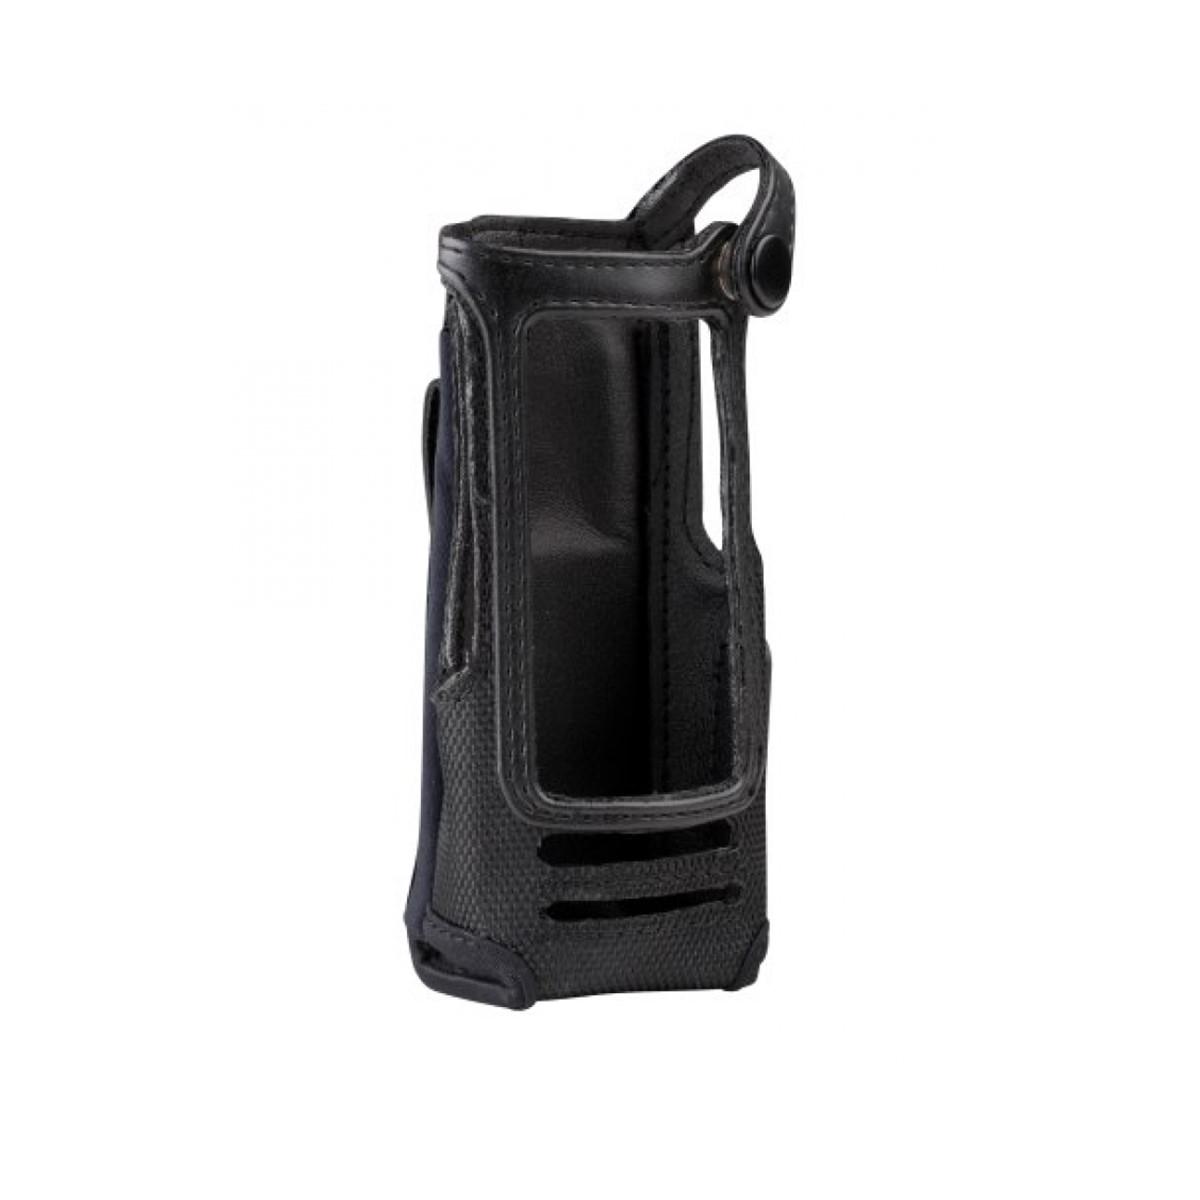 Estuche Motorola PMLN5015A de nylon